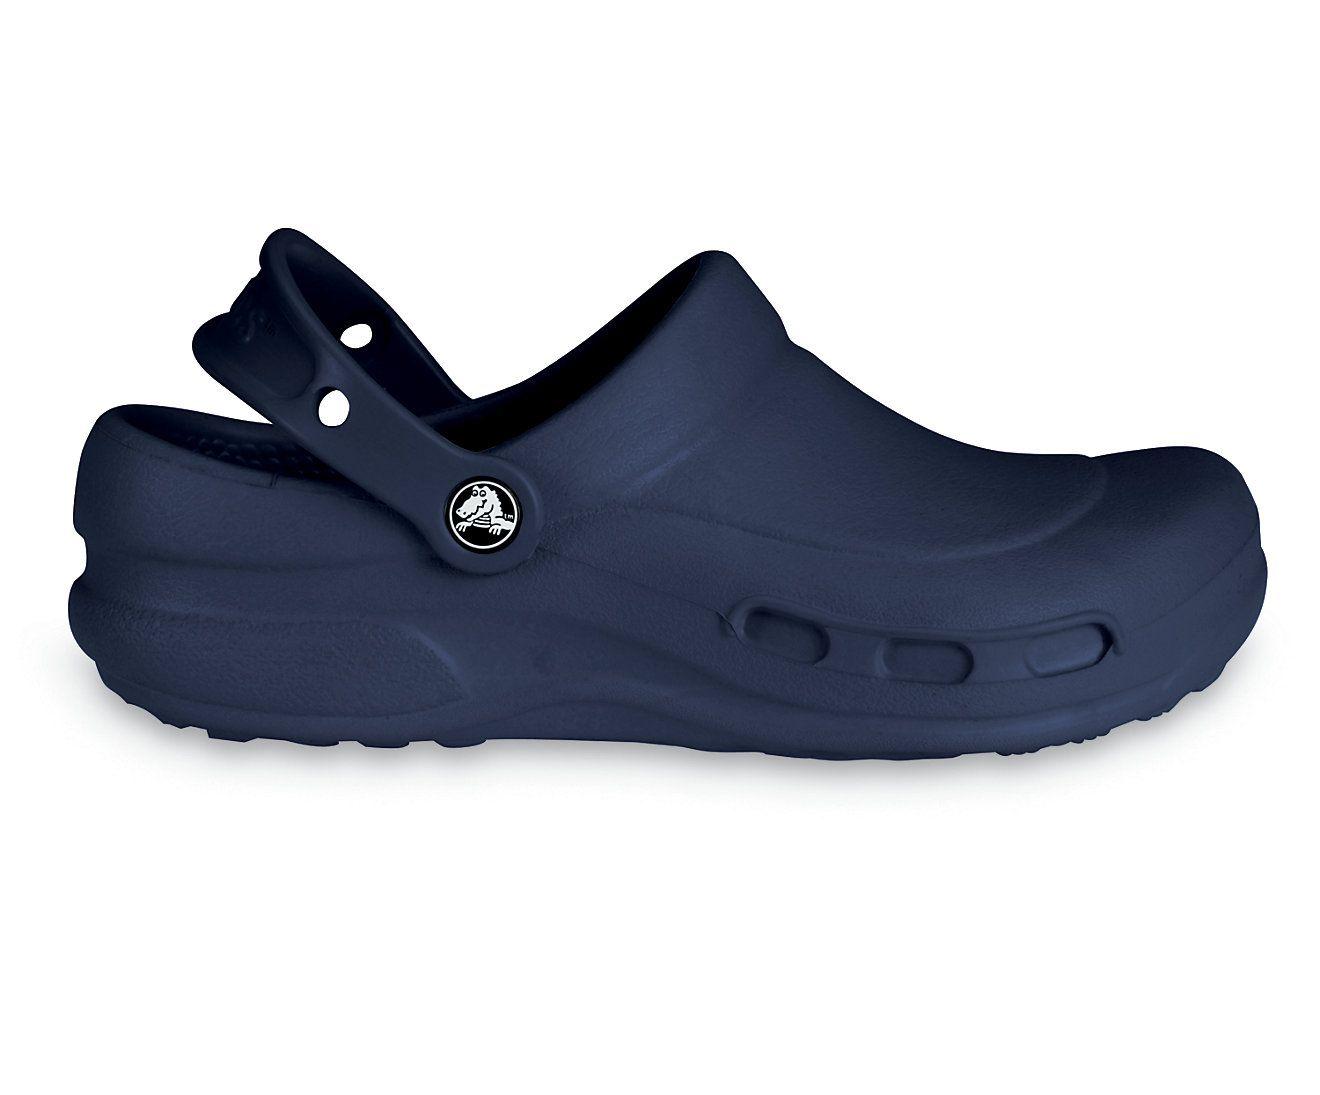 Comfortable Work Shoes | Crocs Shoes